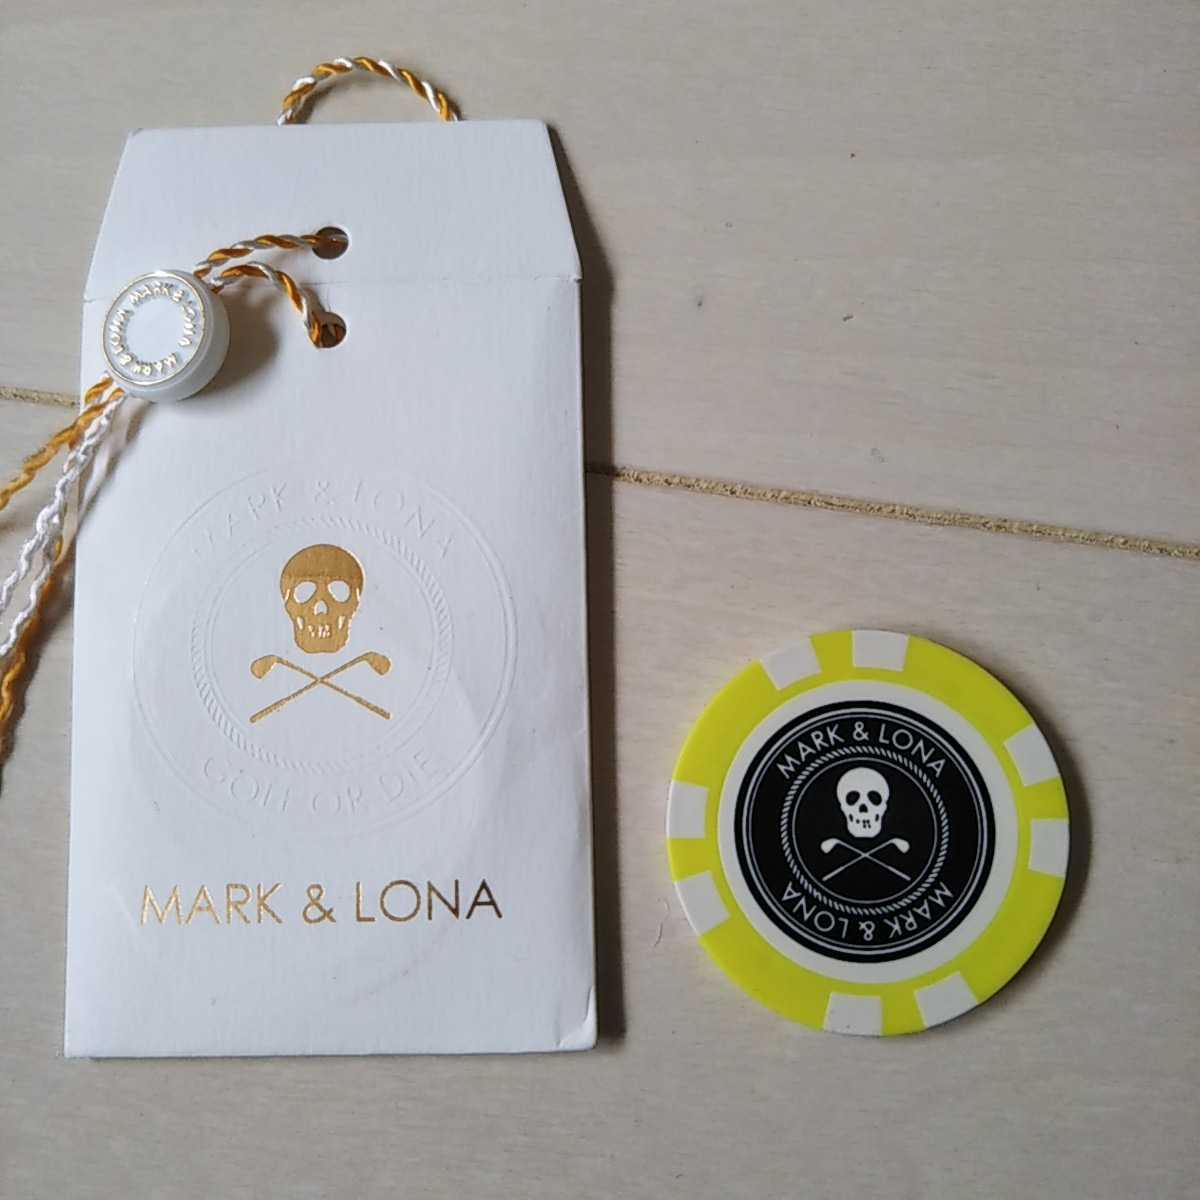 MARK&LONA ゴルフマーカー